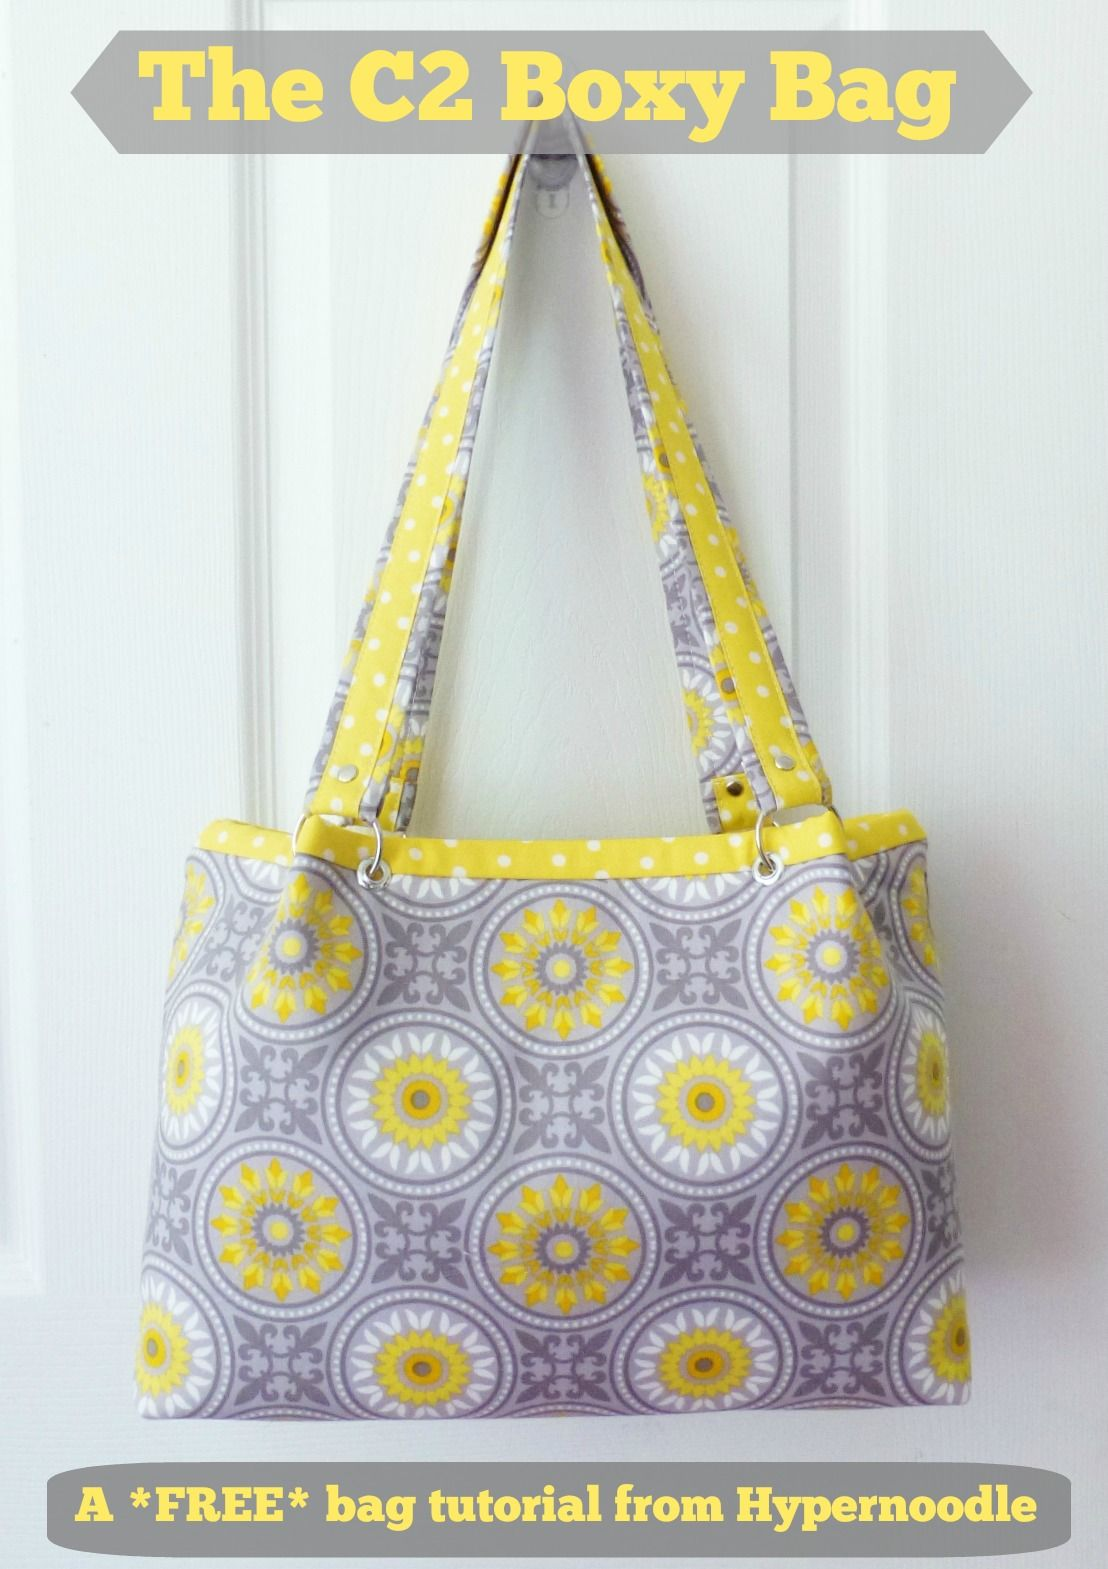 The Hyper Hub: C2 Boxy Bag - FREE Tutorial | Bags | Pinterest ...